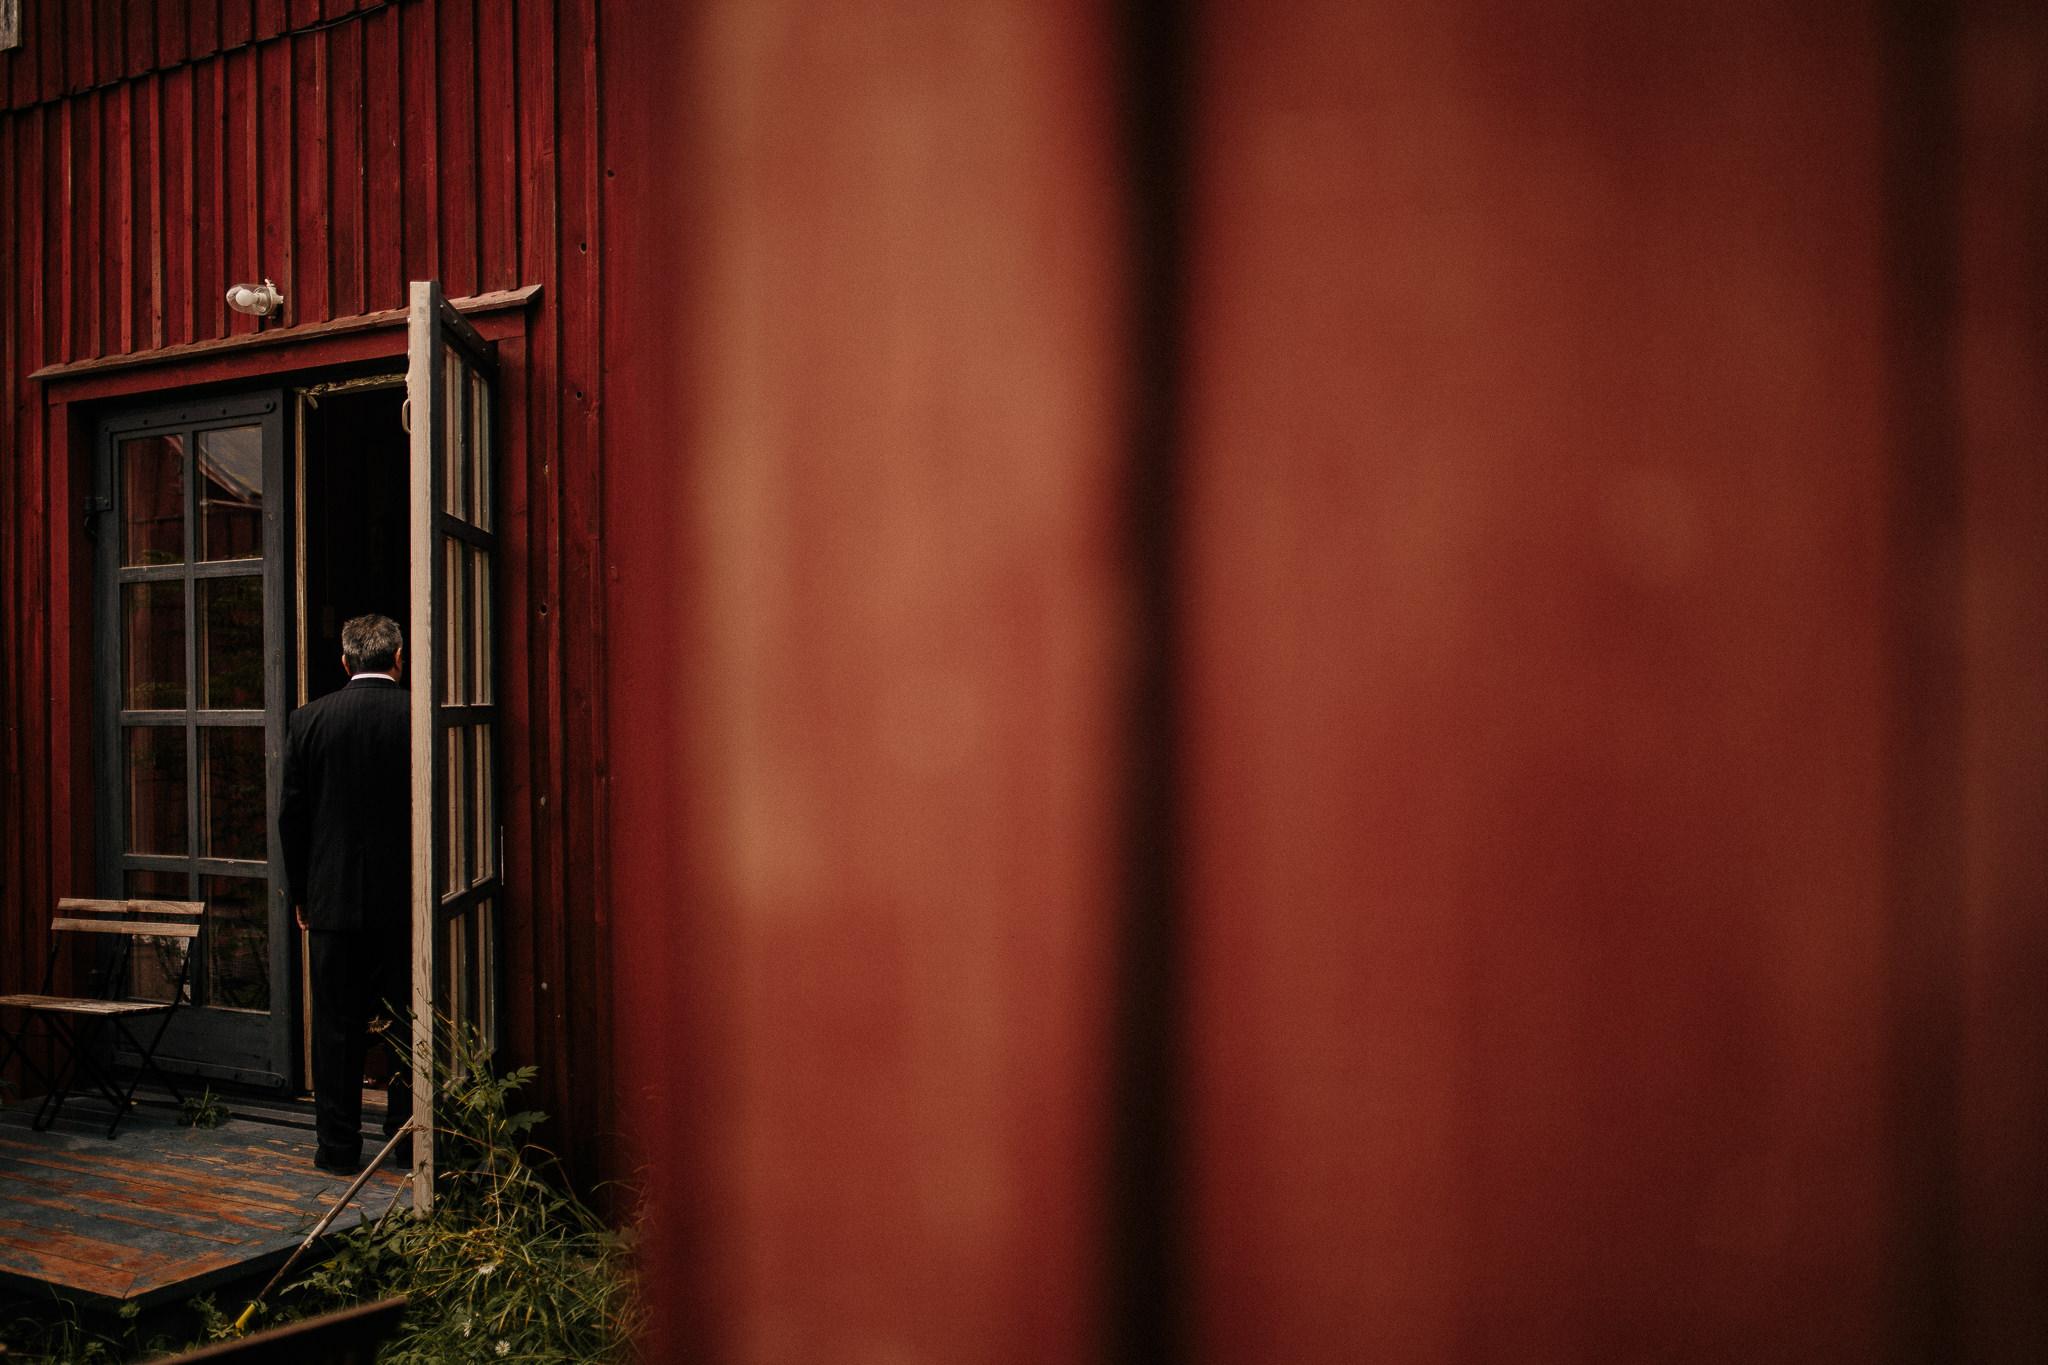 Ceren & Jani - Finland Wedding Photographer - Weddings by Qay - Wedding Photographer (82 of 166).jpg